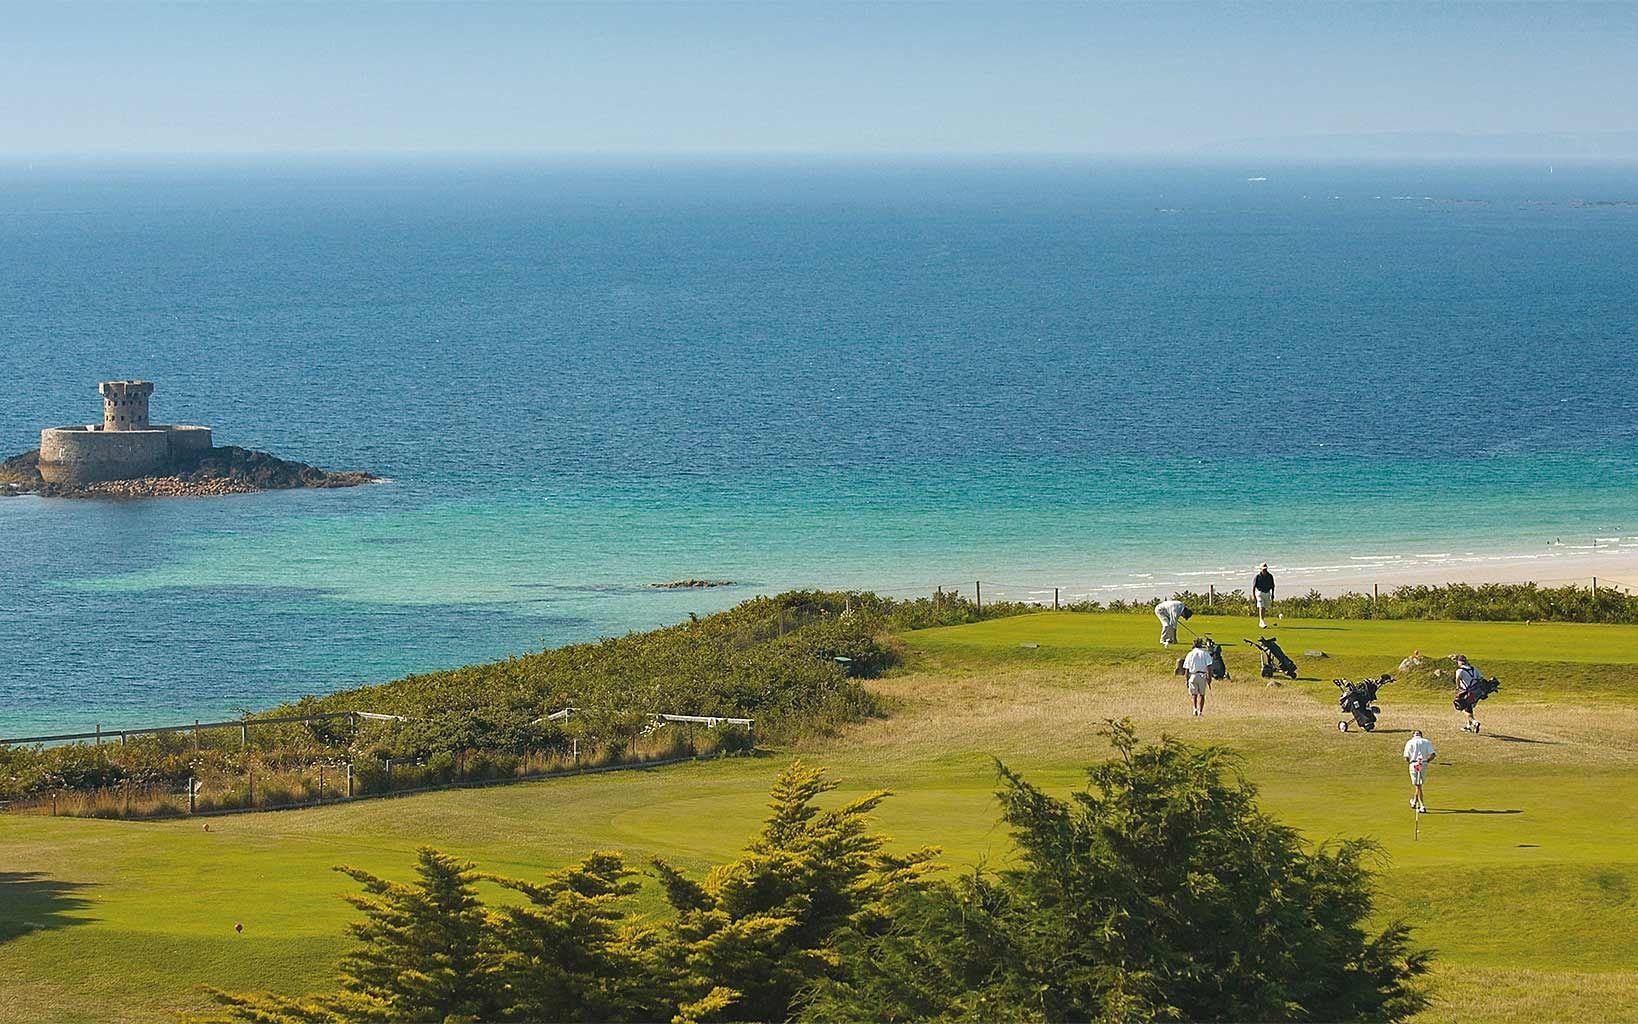 Atlantic Hotel Jersey - Enjoying a spectacular location alongside the hotel is La Moye championship golf course. - www.theatlantichotel.com -  #AtlanticJersey #AtlanticHotelJersey #slh #BoutiqueHotel #SmallLuxuryHotels #stouensbay #jerseychannelislands